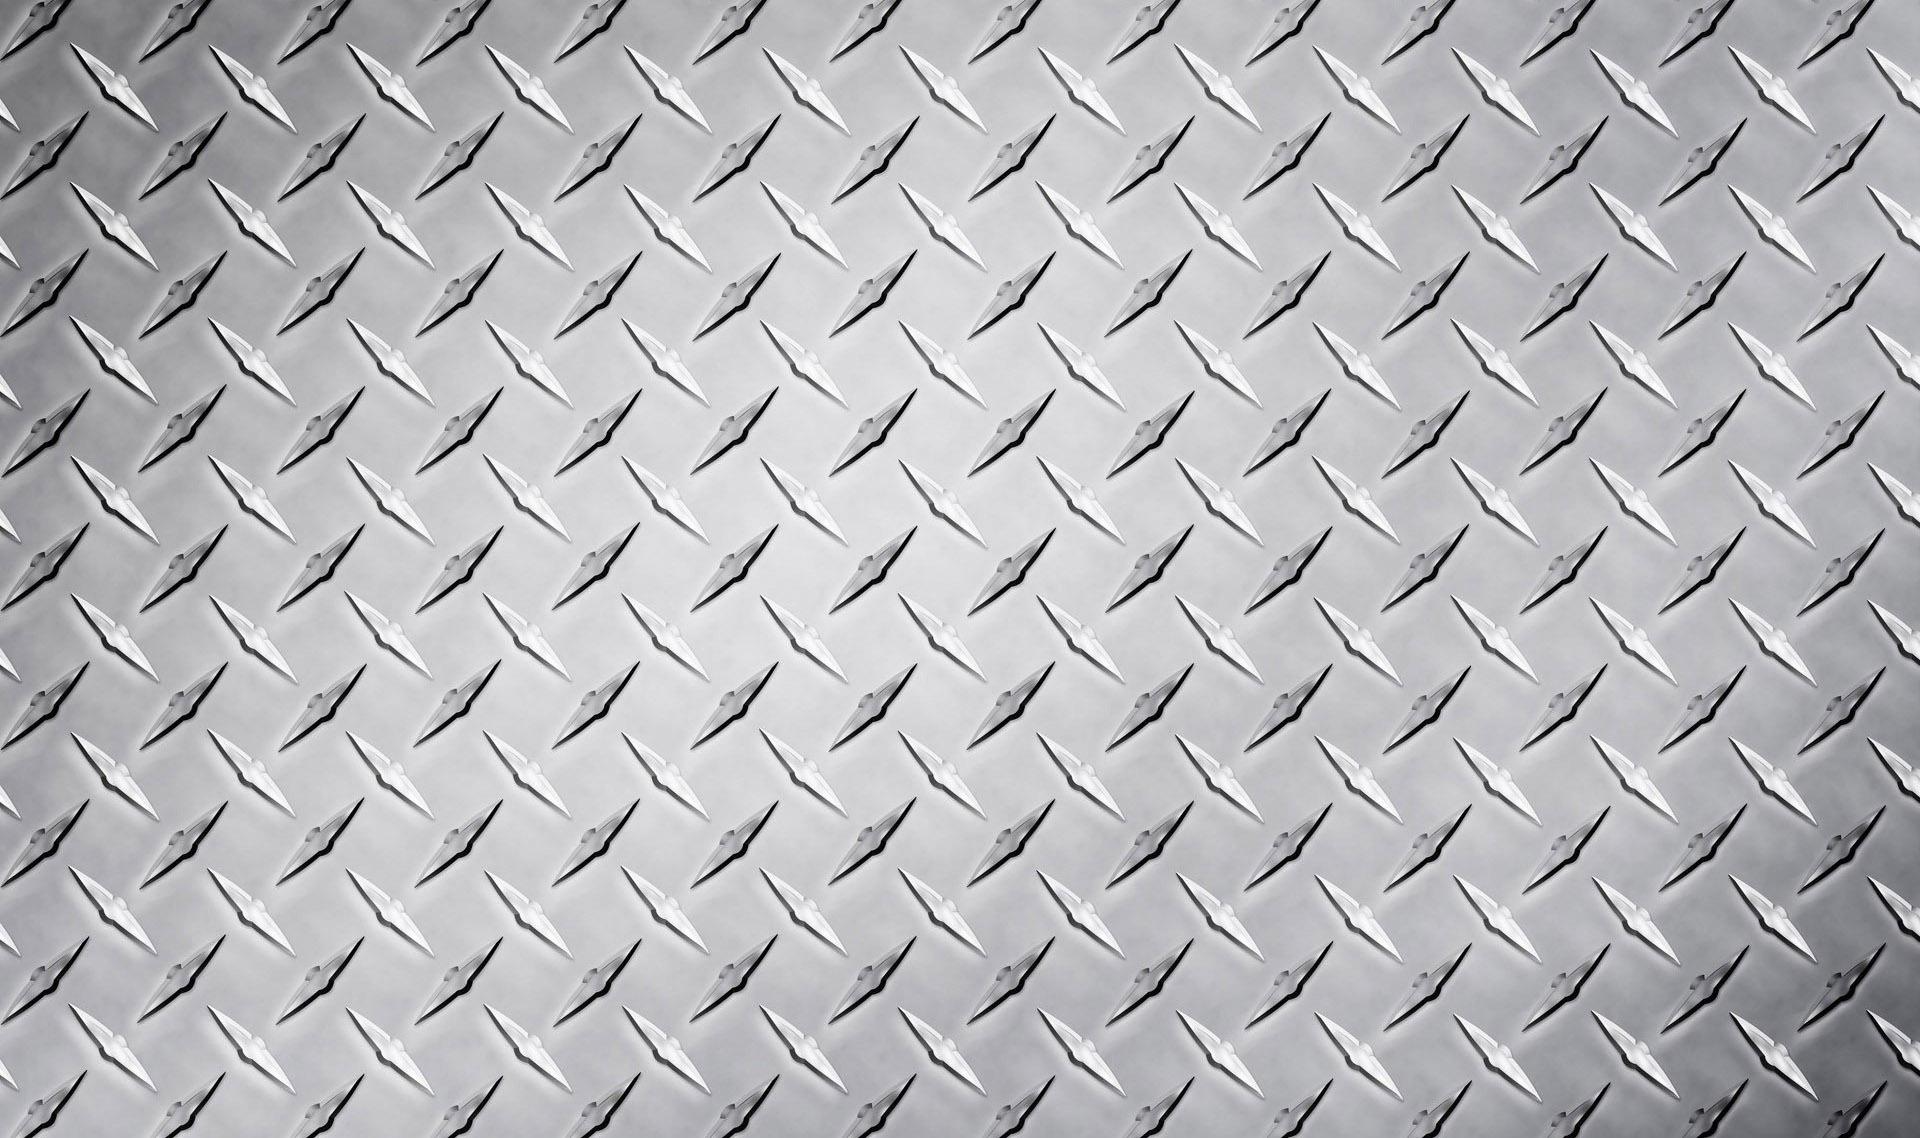 Black Diamond Pattern Iphone Wallpaper 1920x1138